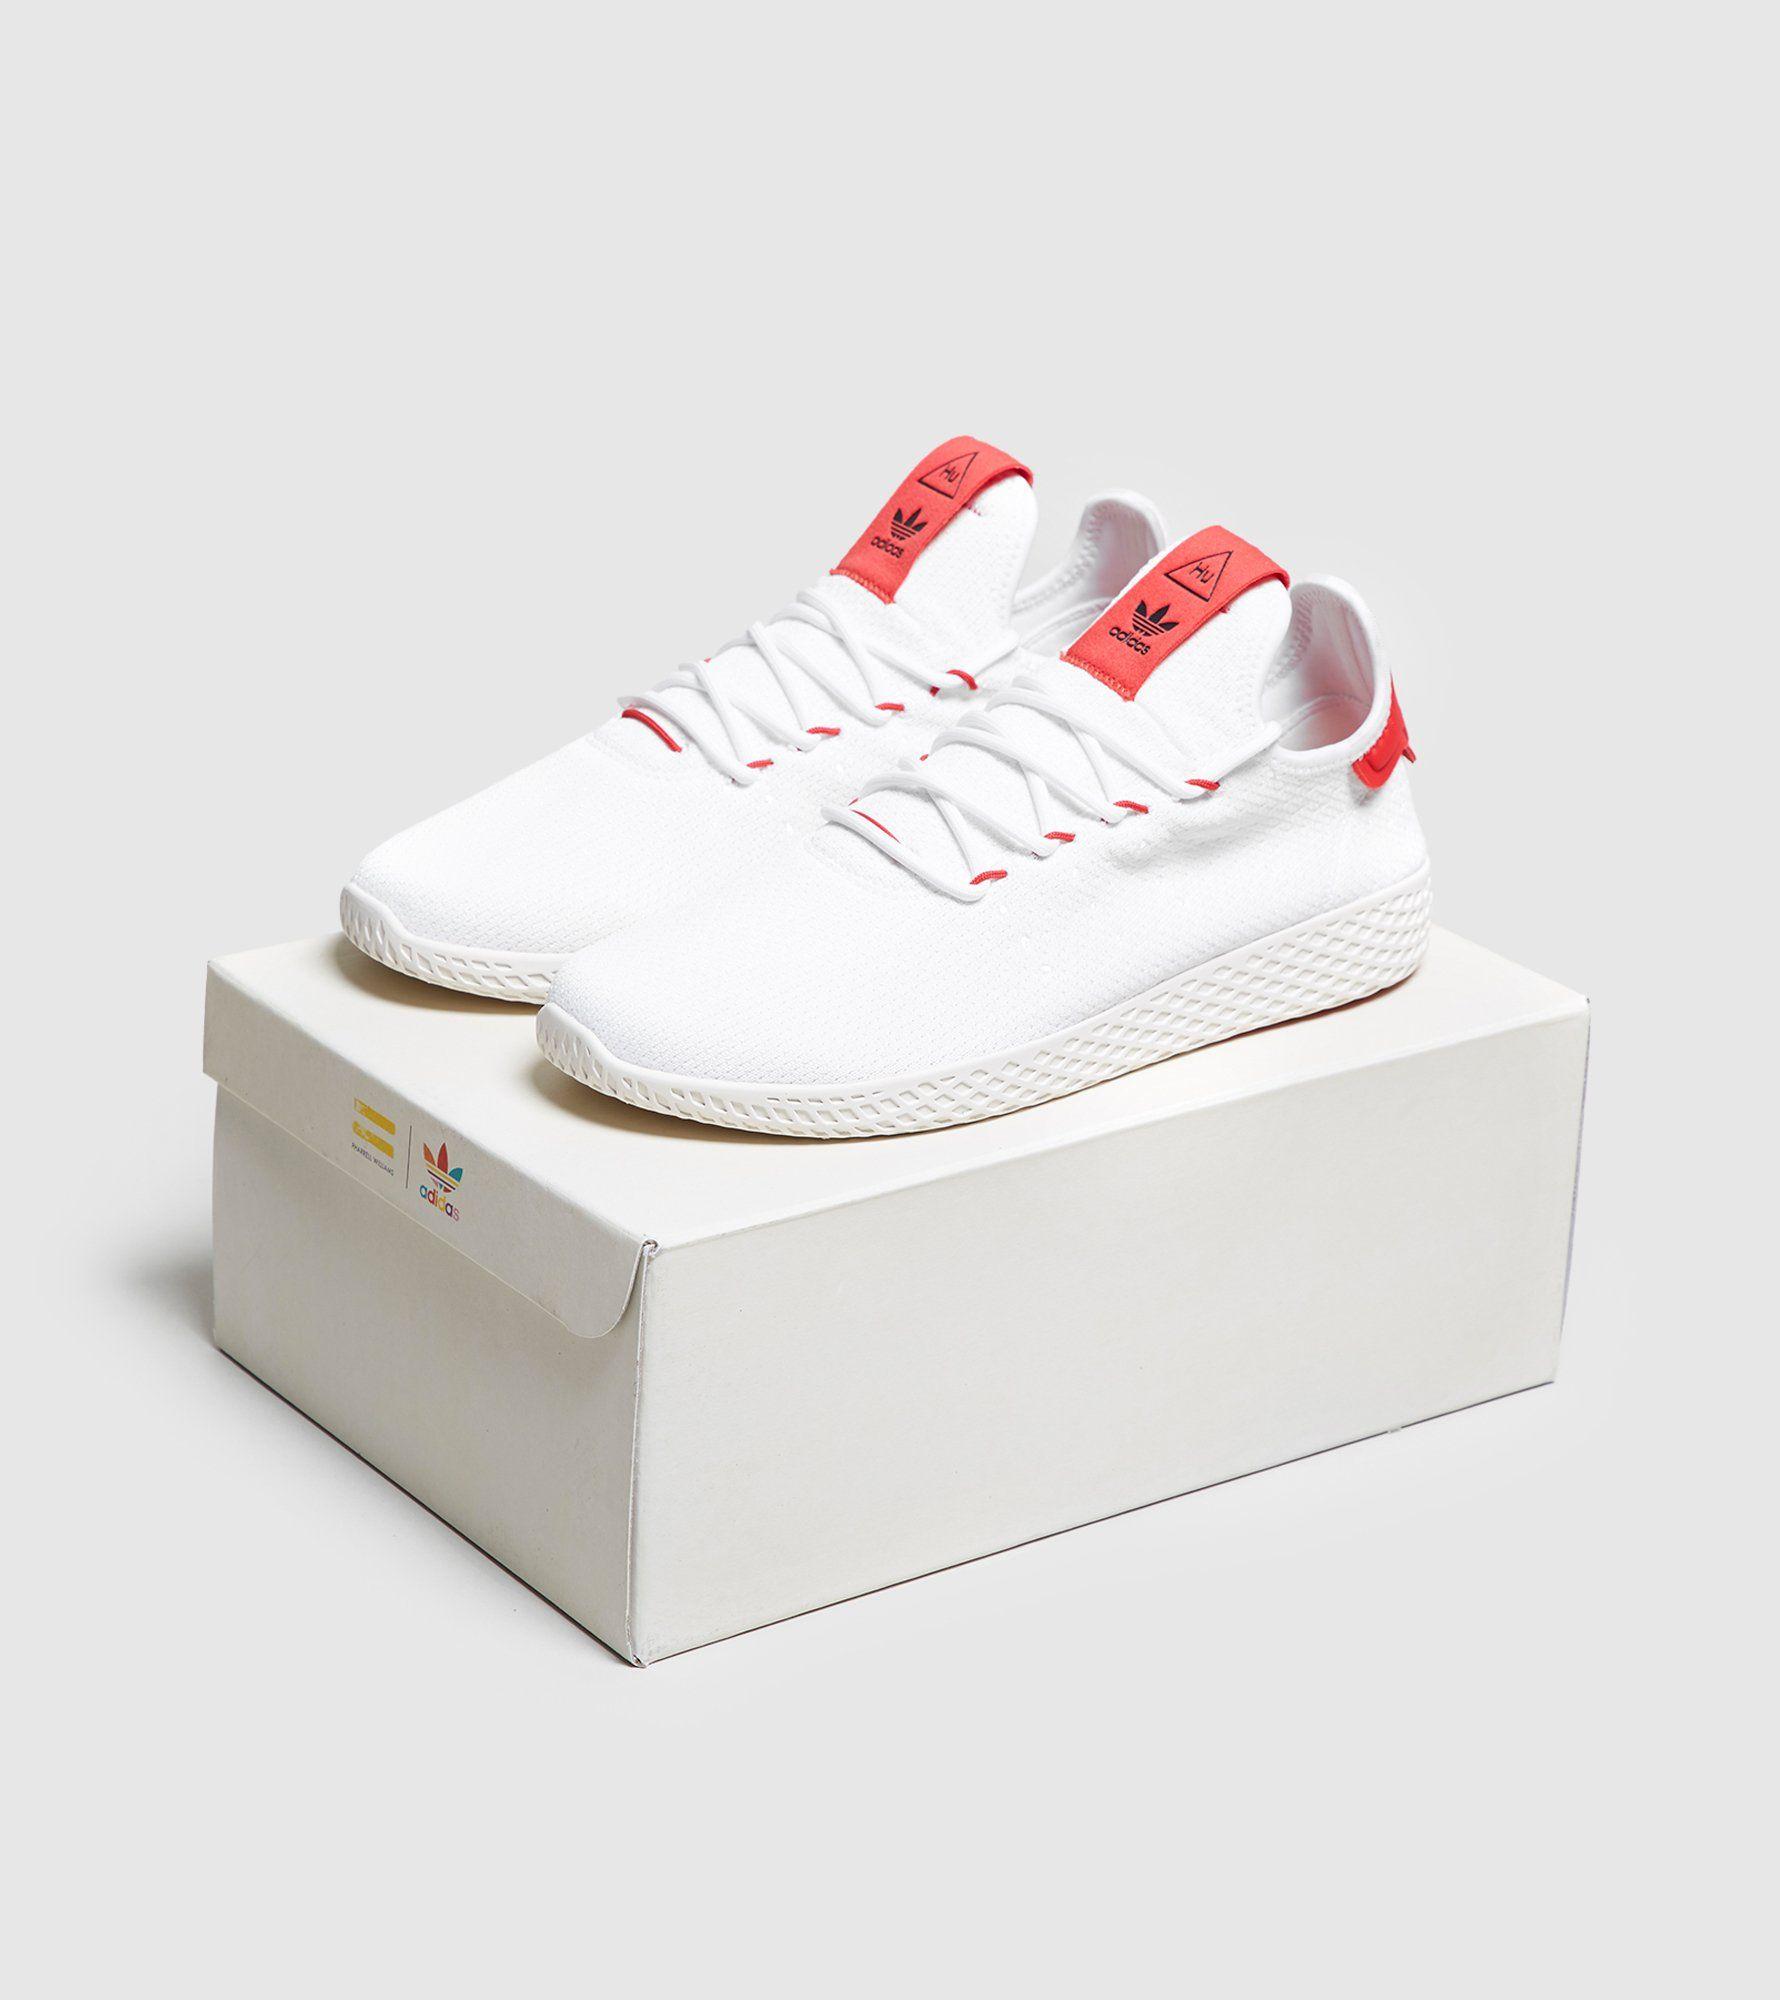 adidas Originals x Pharrell Williams Tennis Hu